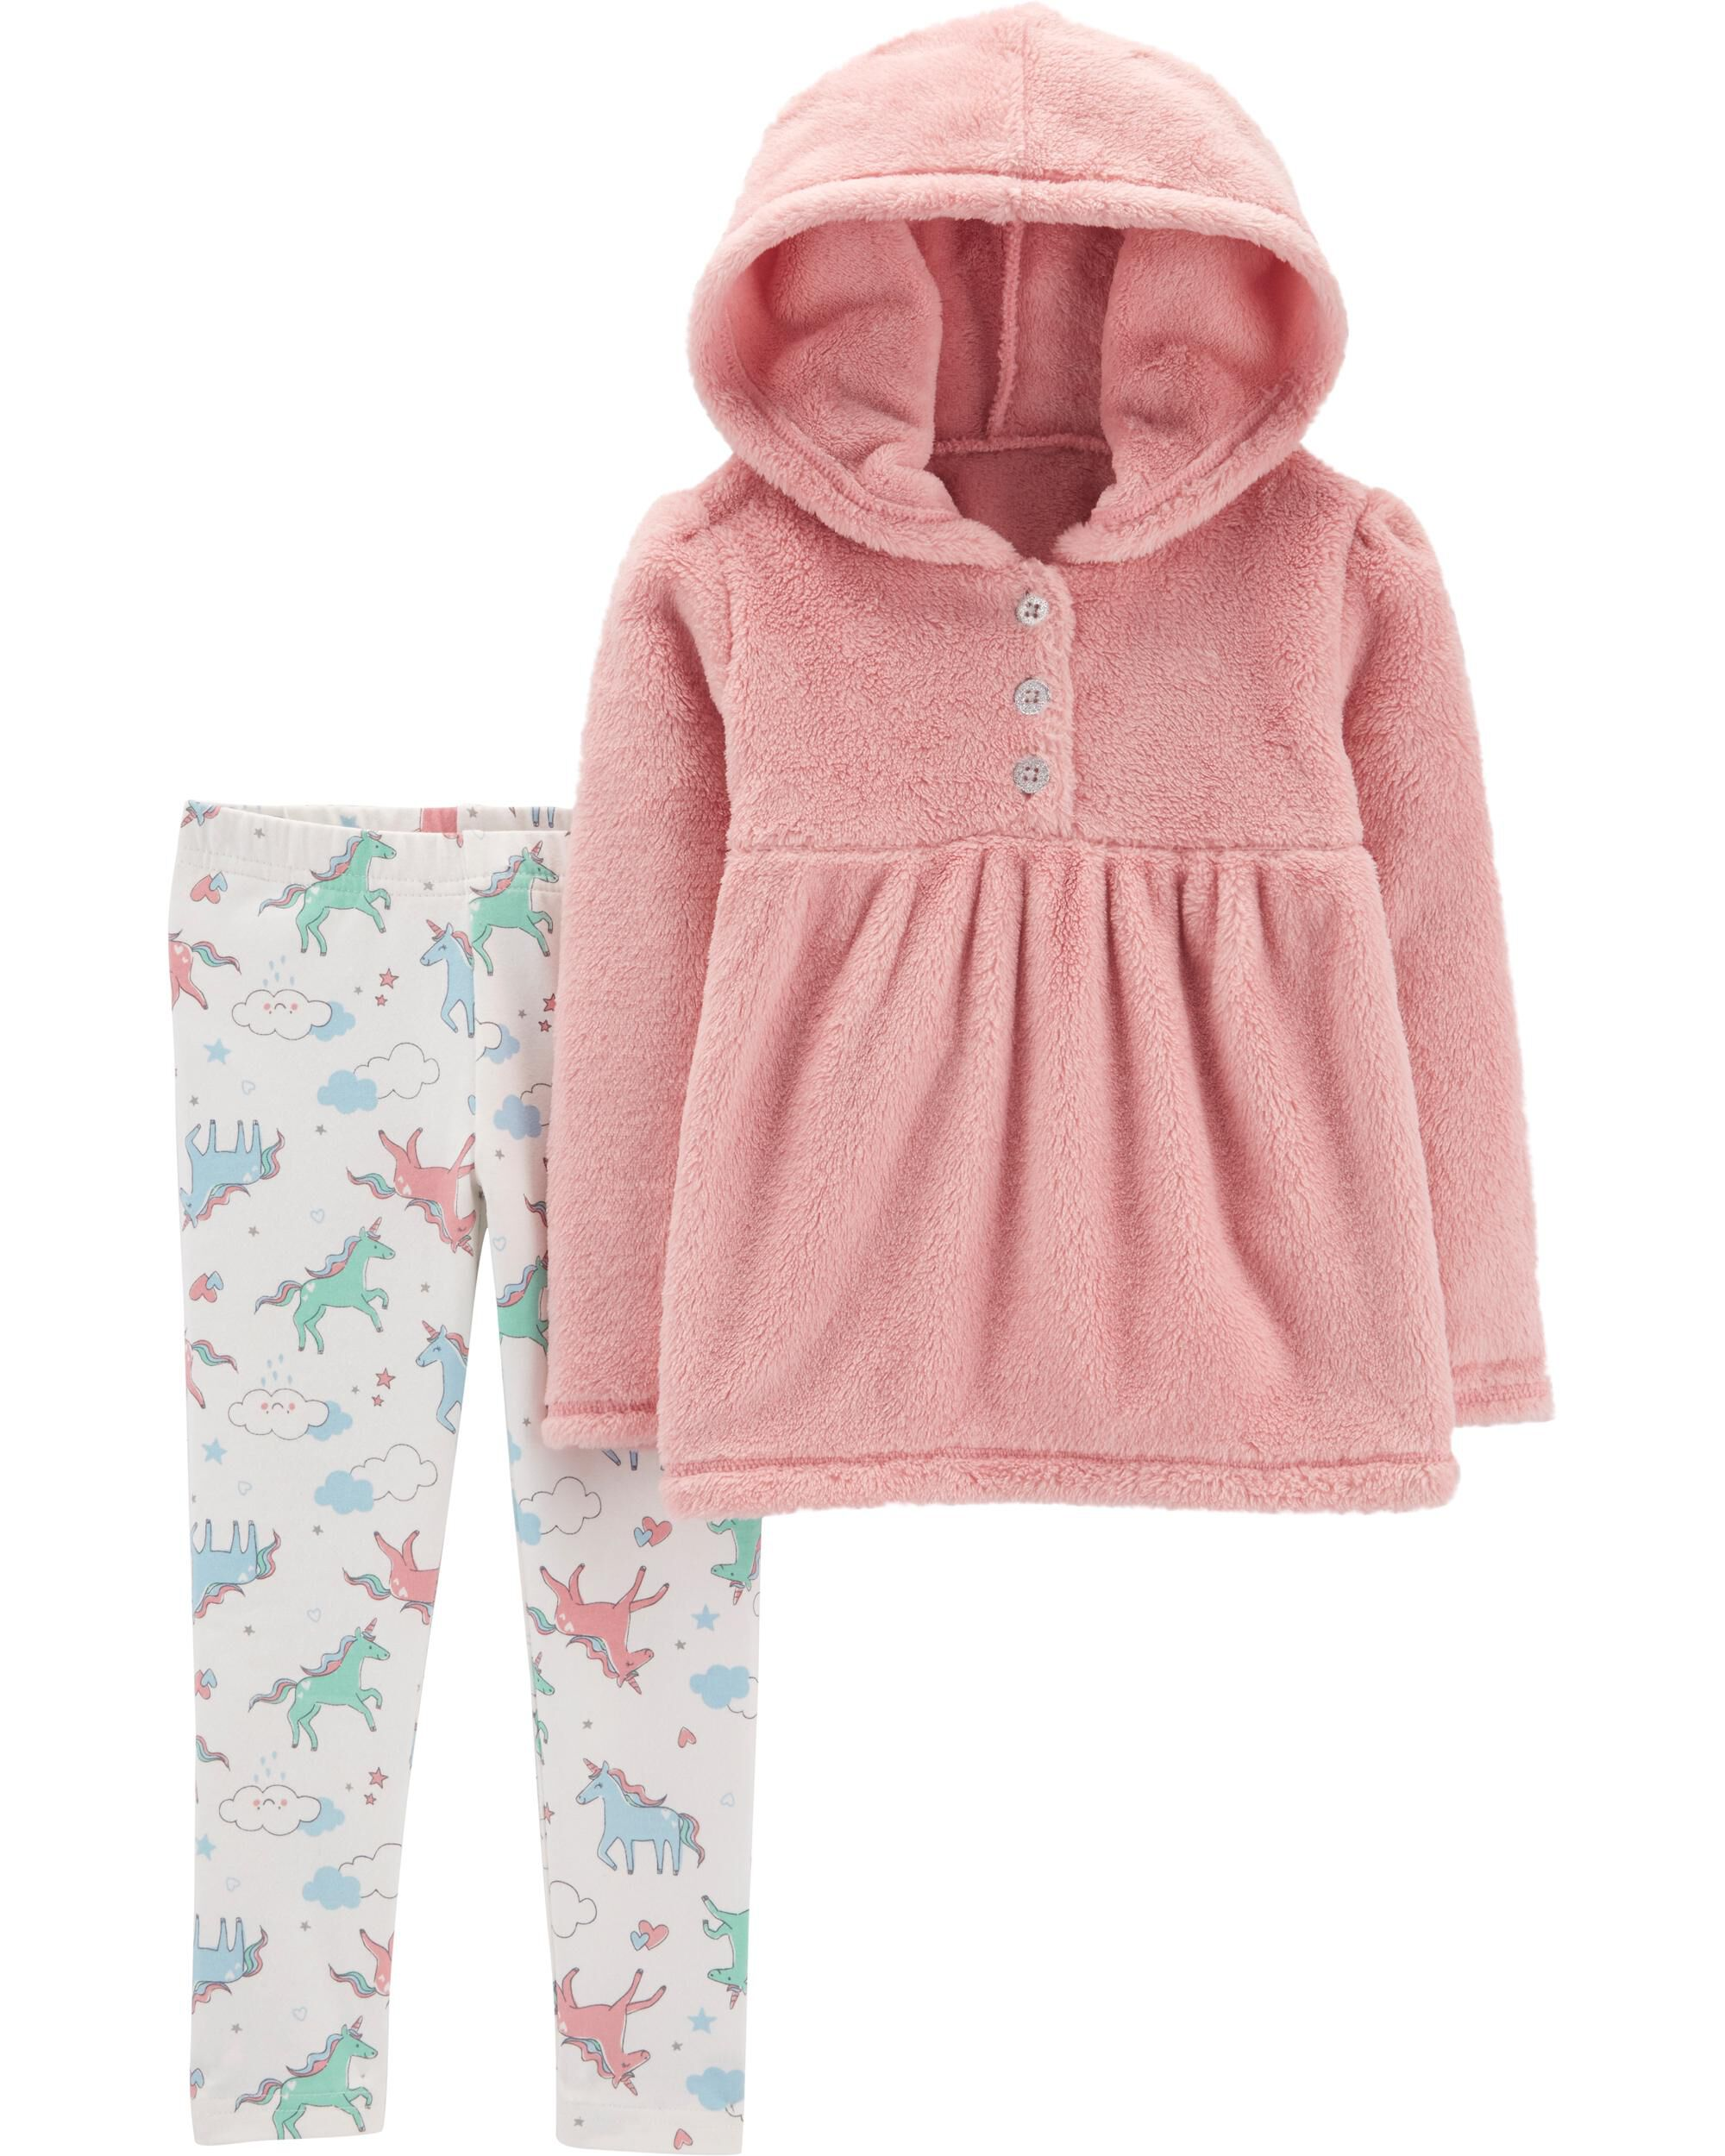 Baby Girls Next Unicorn Hoody And Leggings Set Size 12-18m Girls' Clothing (newborn-5t) Outfits & Sets